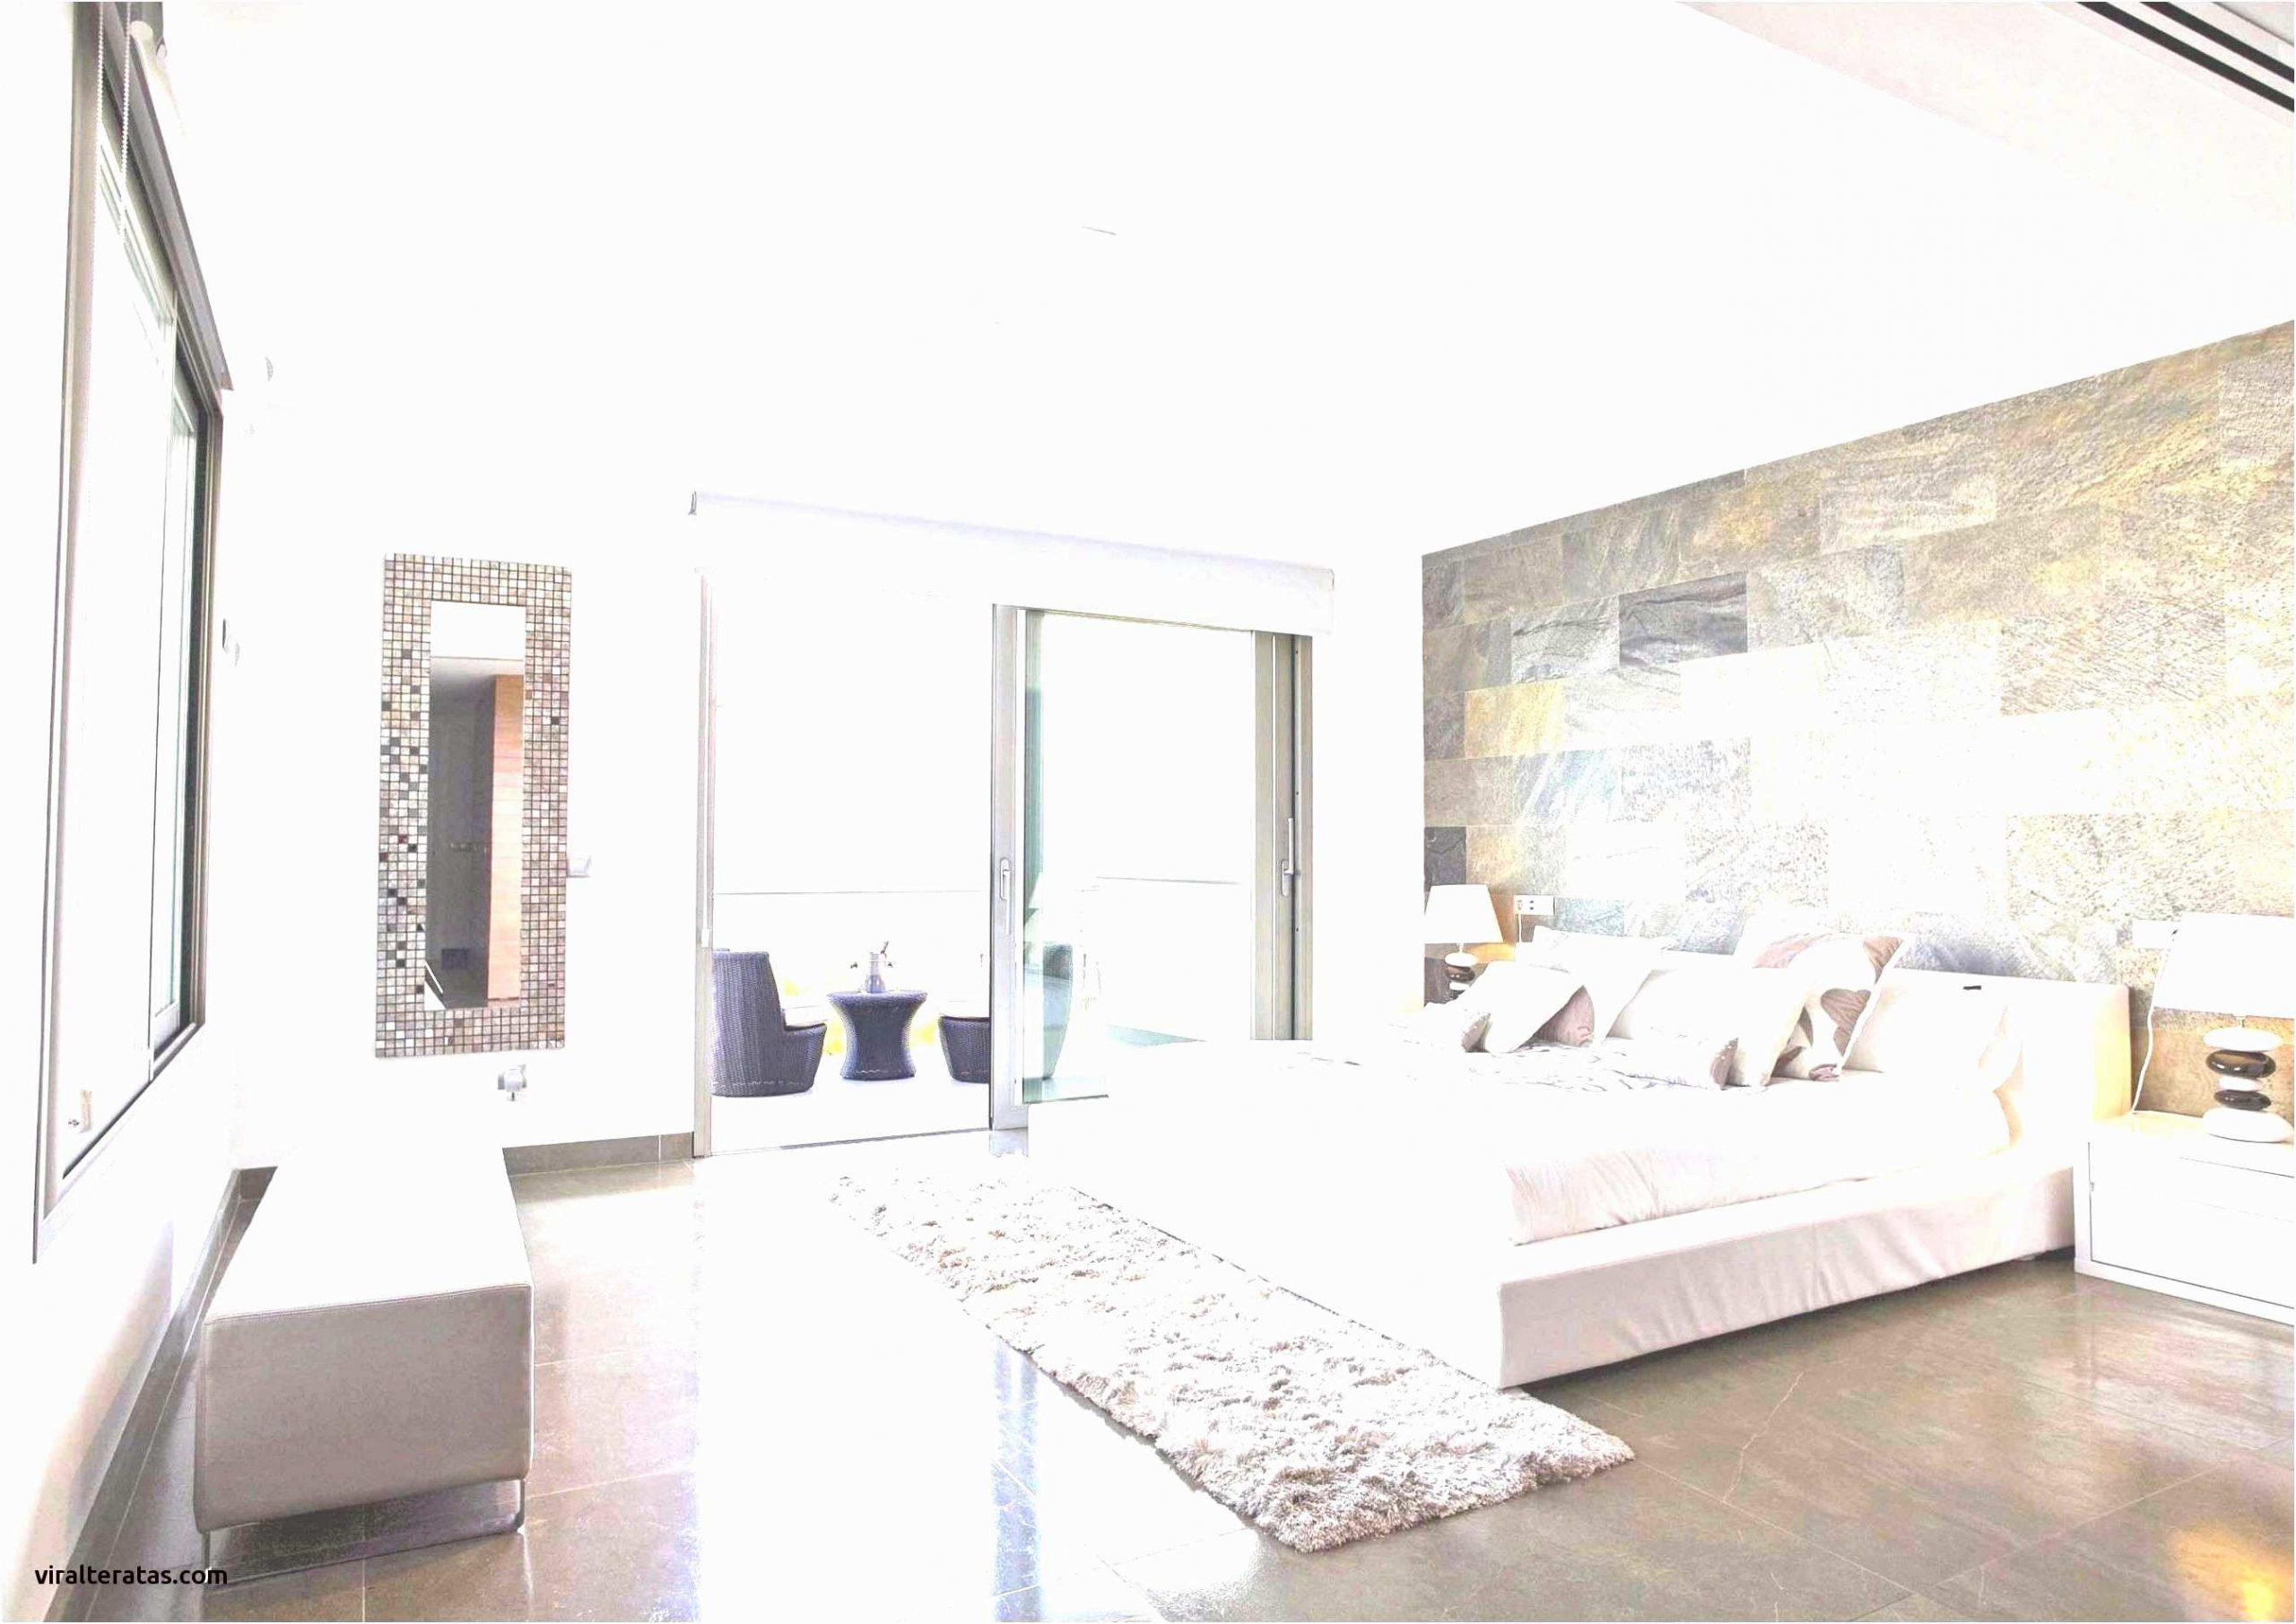 Full Size of Kchen Tapeten Vlies Luxus Kche Ideen Neu Wohnzimmer Küchentapeten